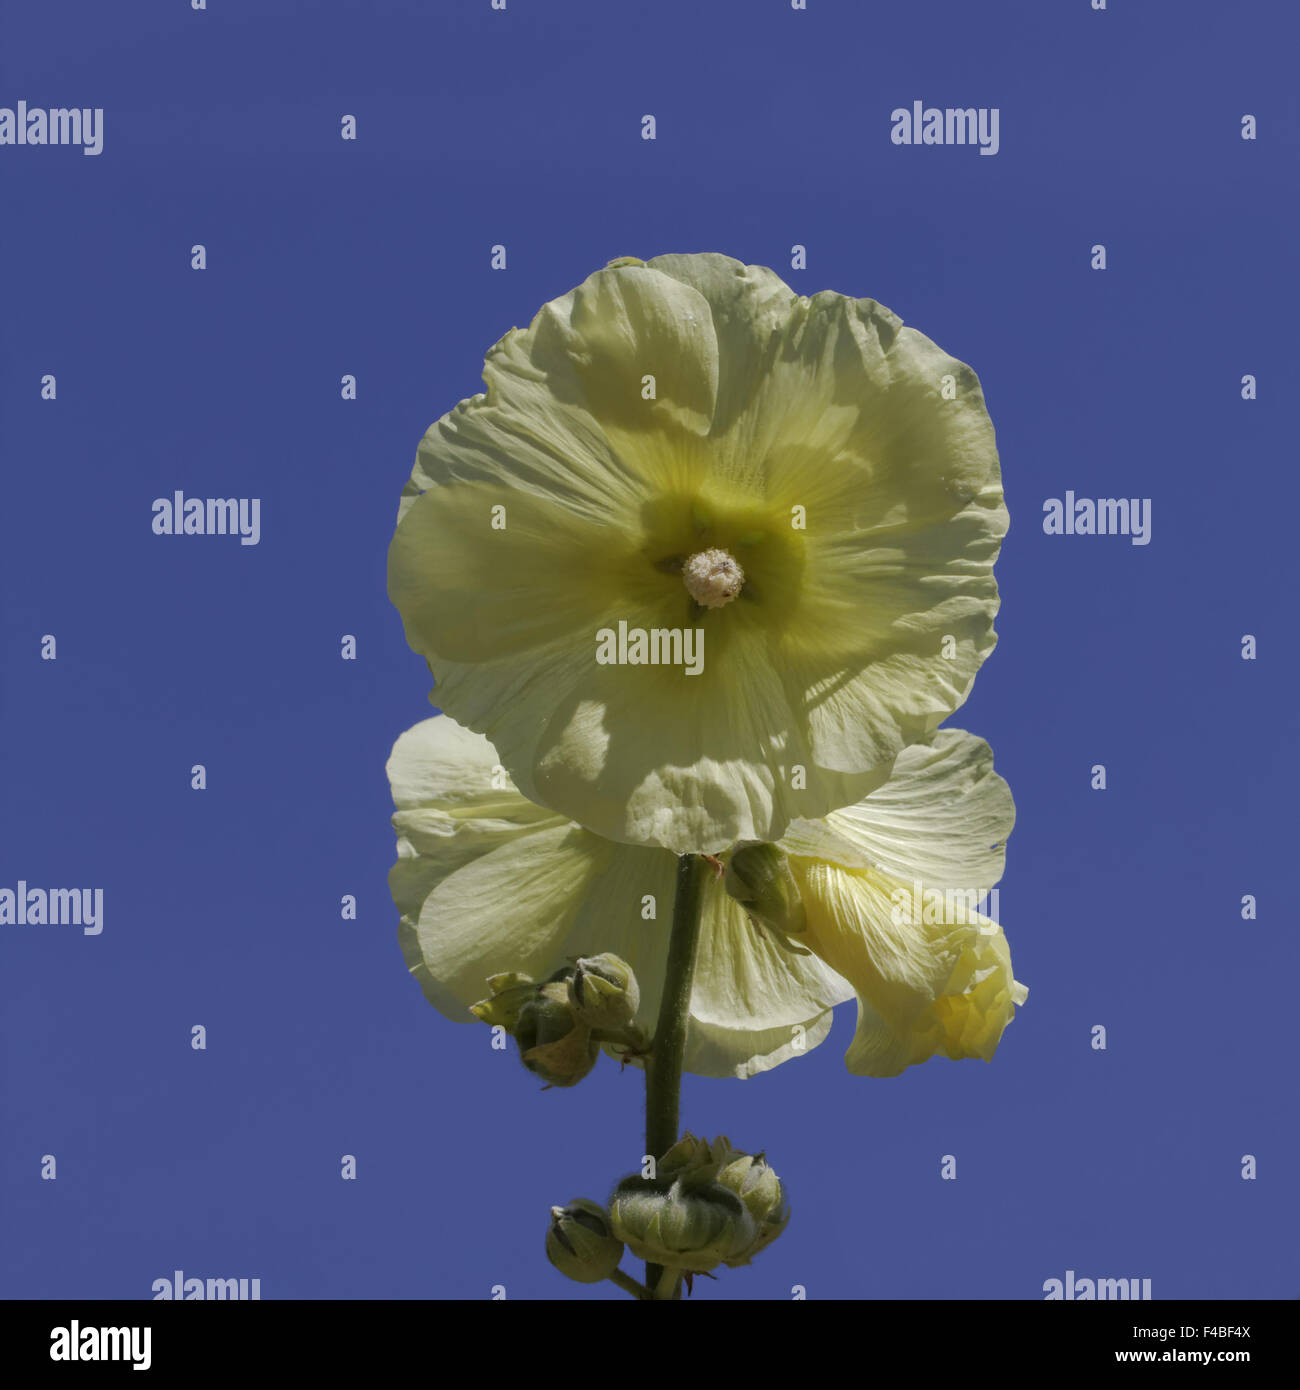 Althaea ficifolia (Alcea rosea), Marsh Mallow Stock Photo